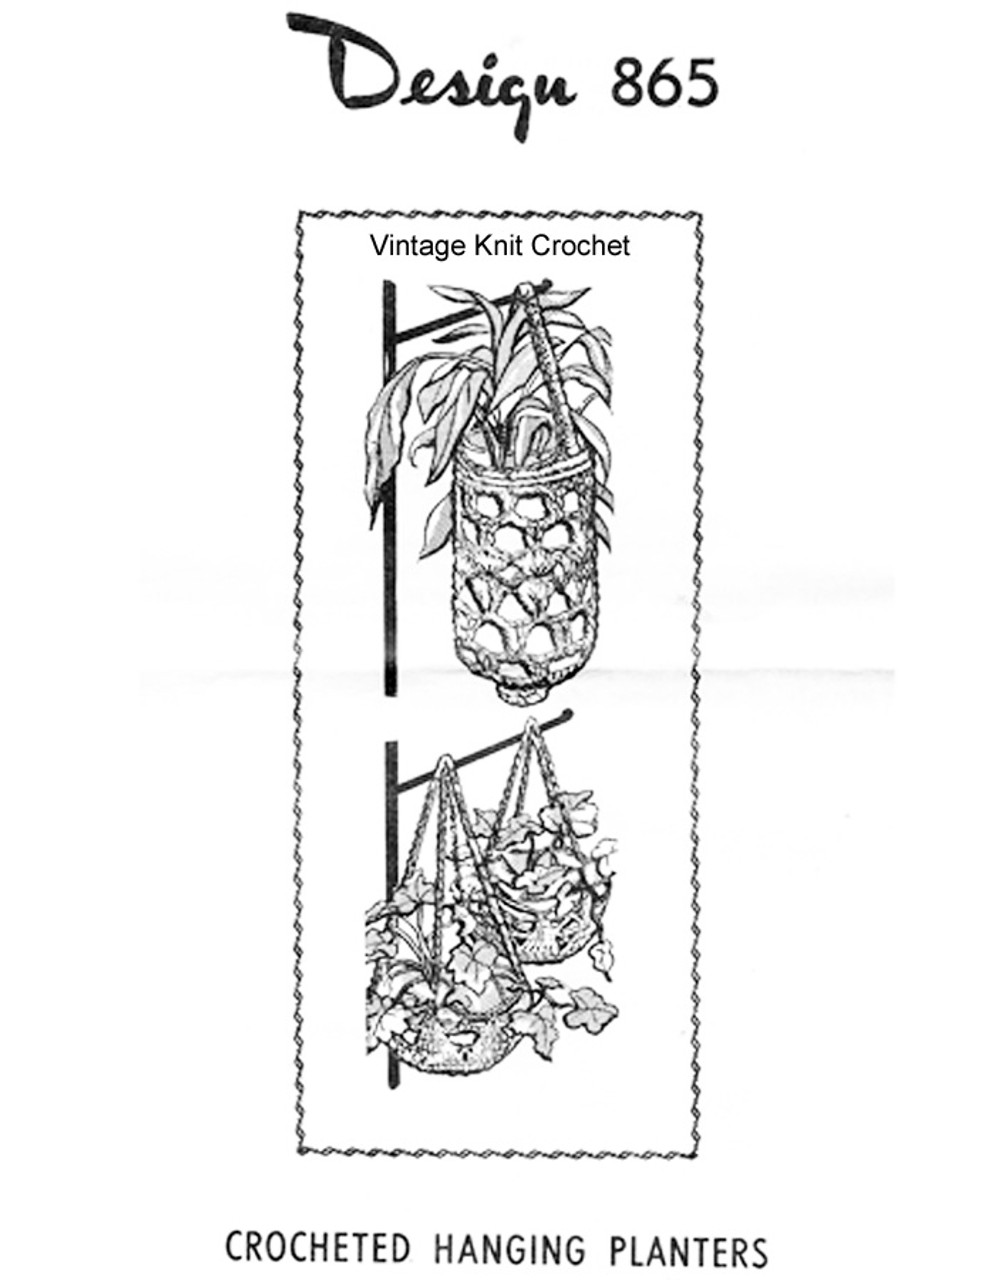 Hanging Basket Crochet Pattern, Mail Order 865